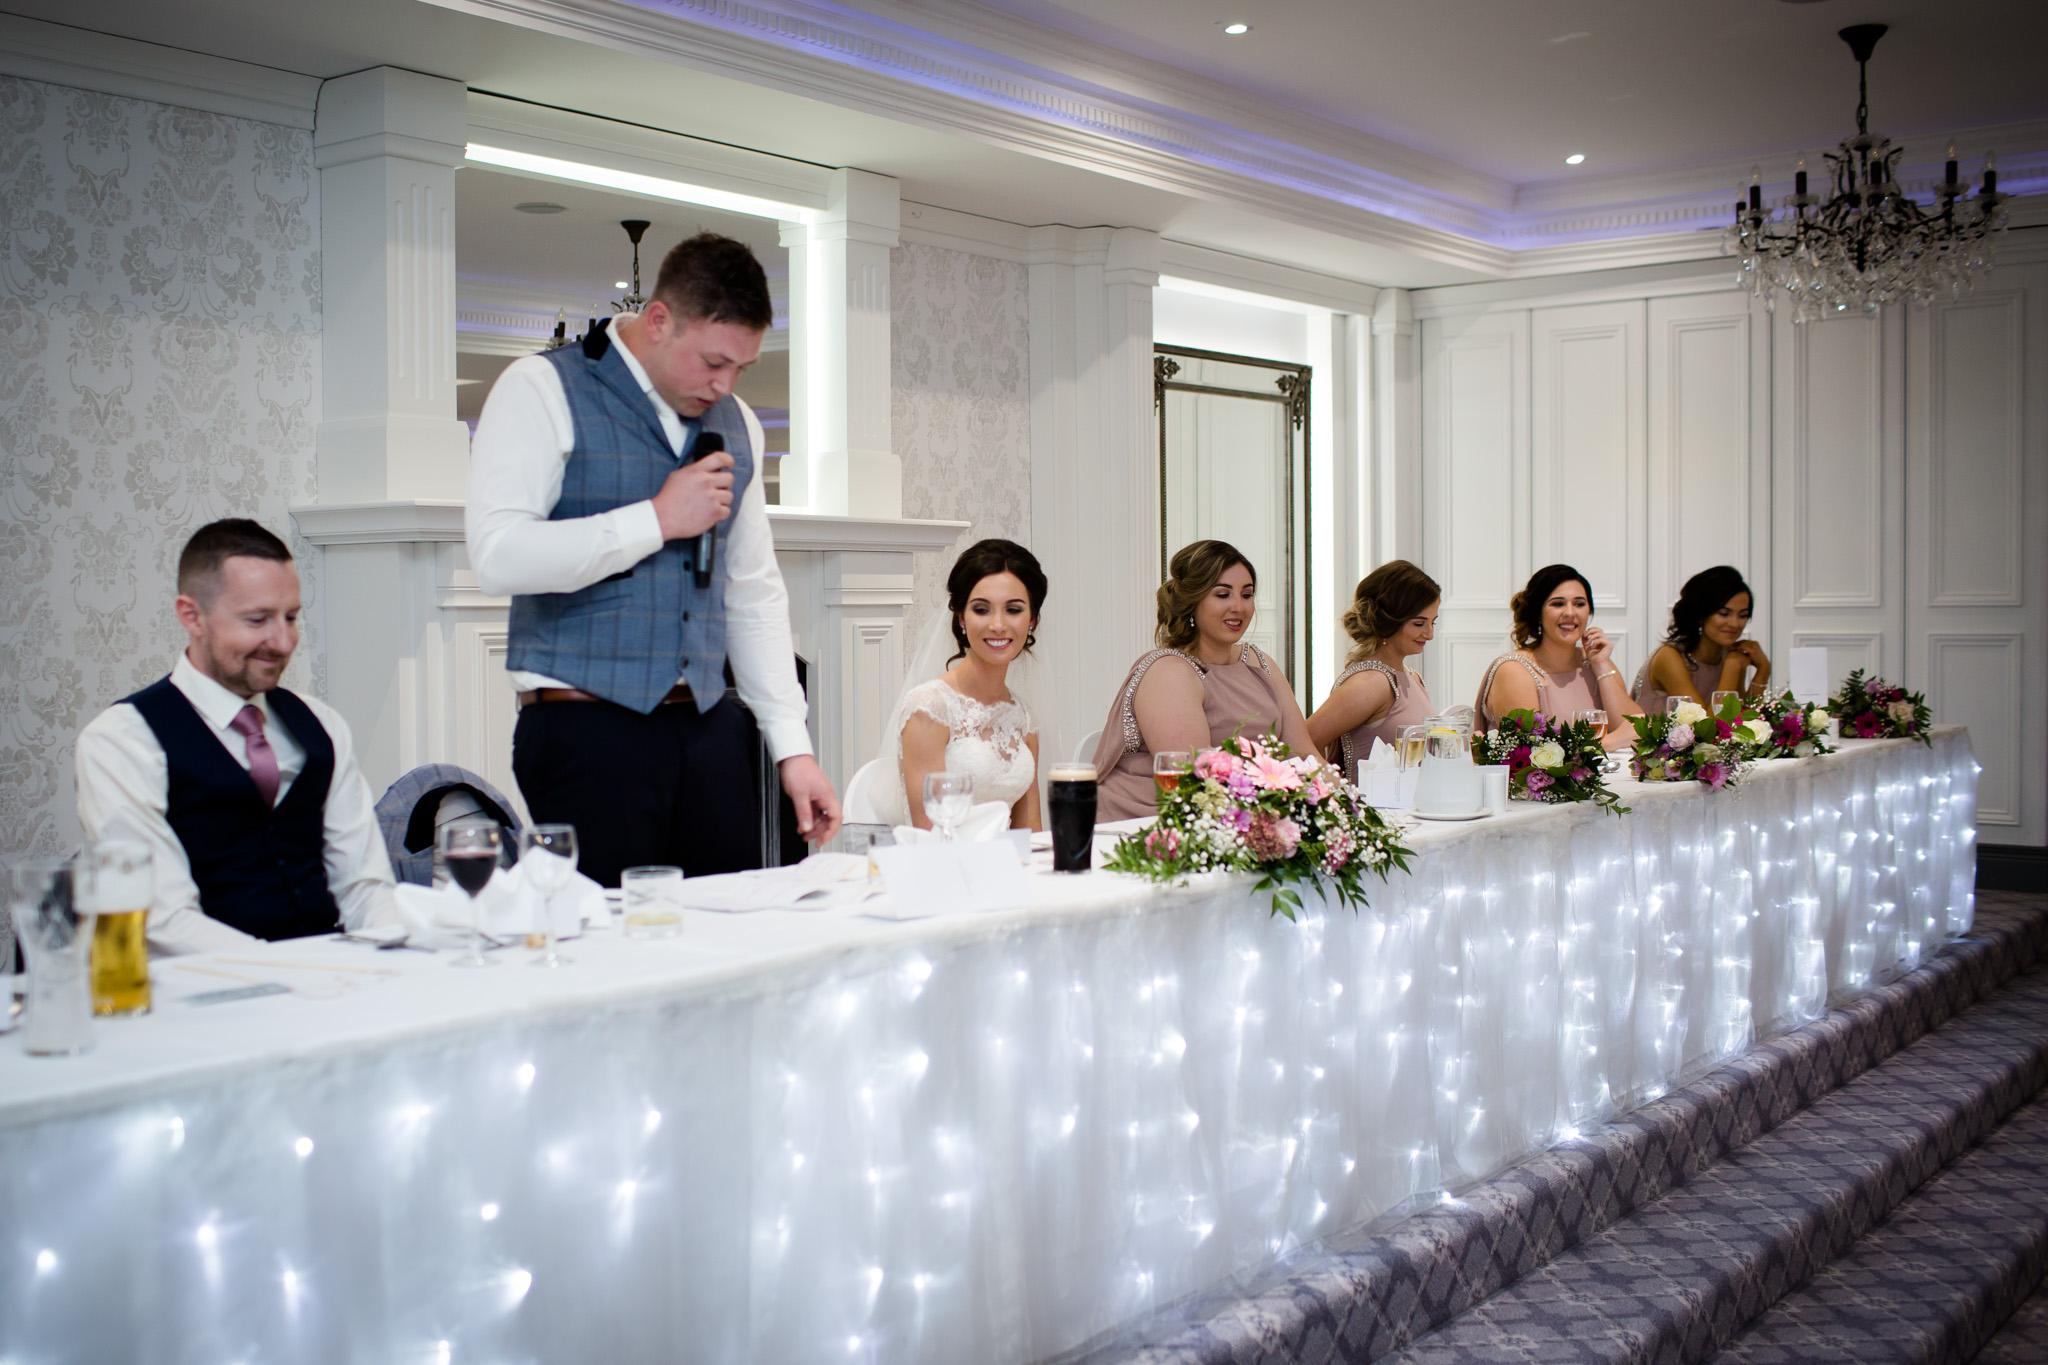 Mark_Barnes_Northern_Ireland_Wedding_Photography_Leighinmohr-house-hotel-ballymena_Wedding_Photography-57.jpg